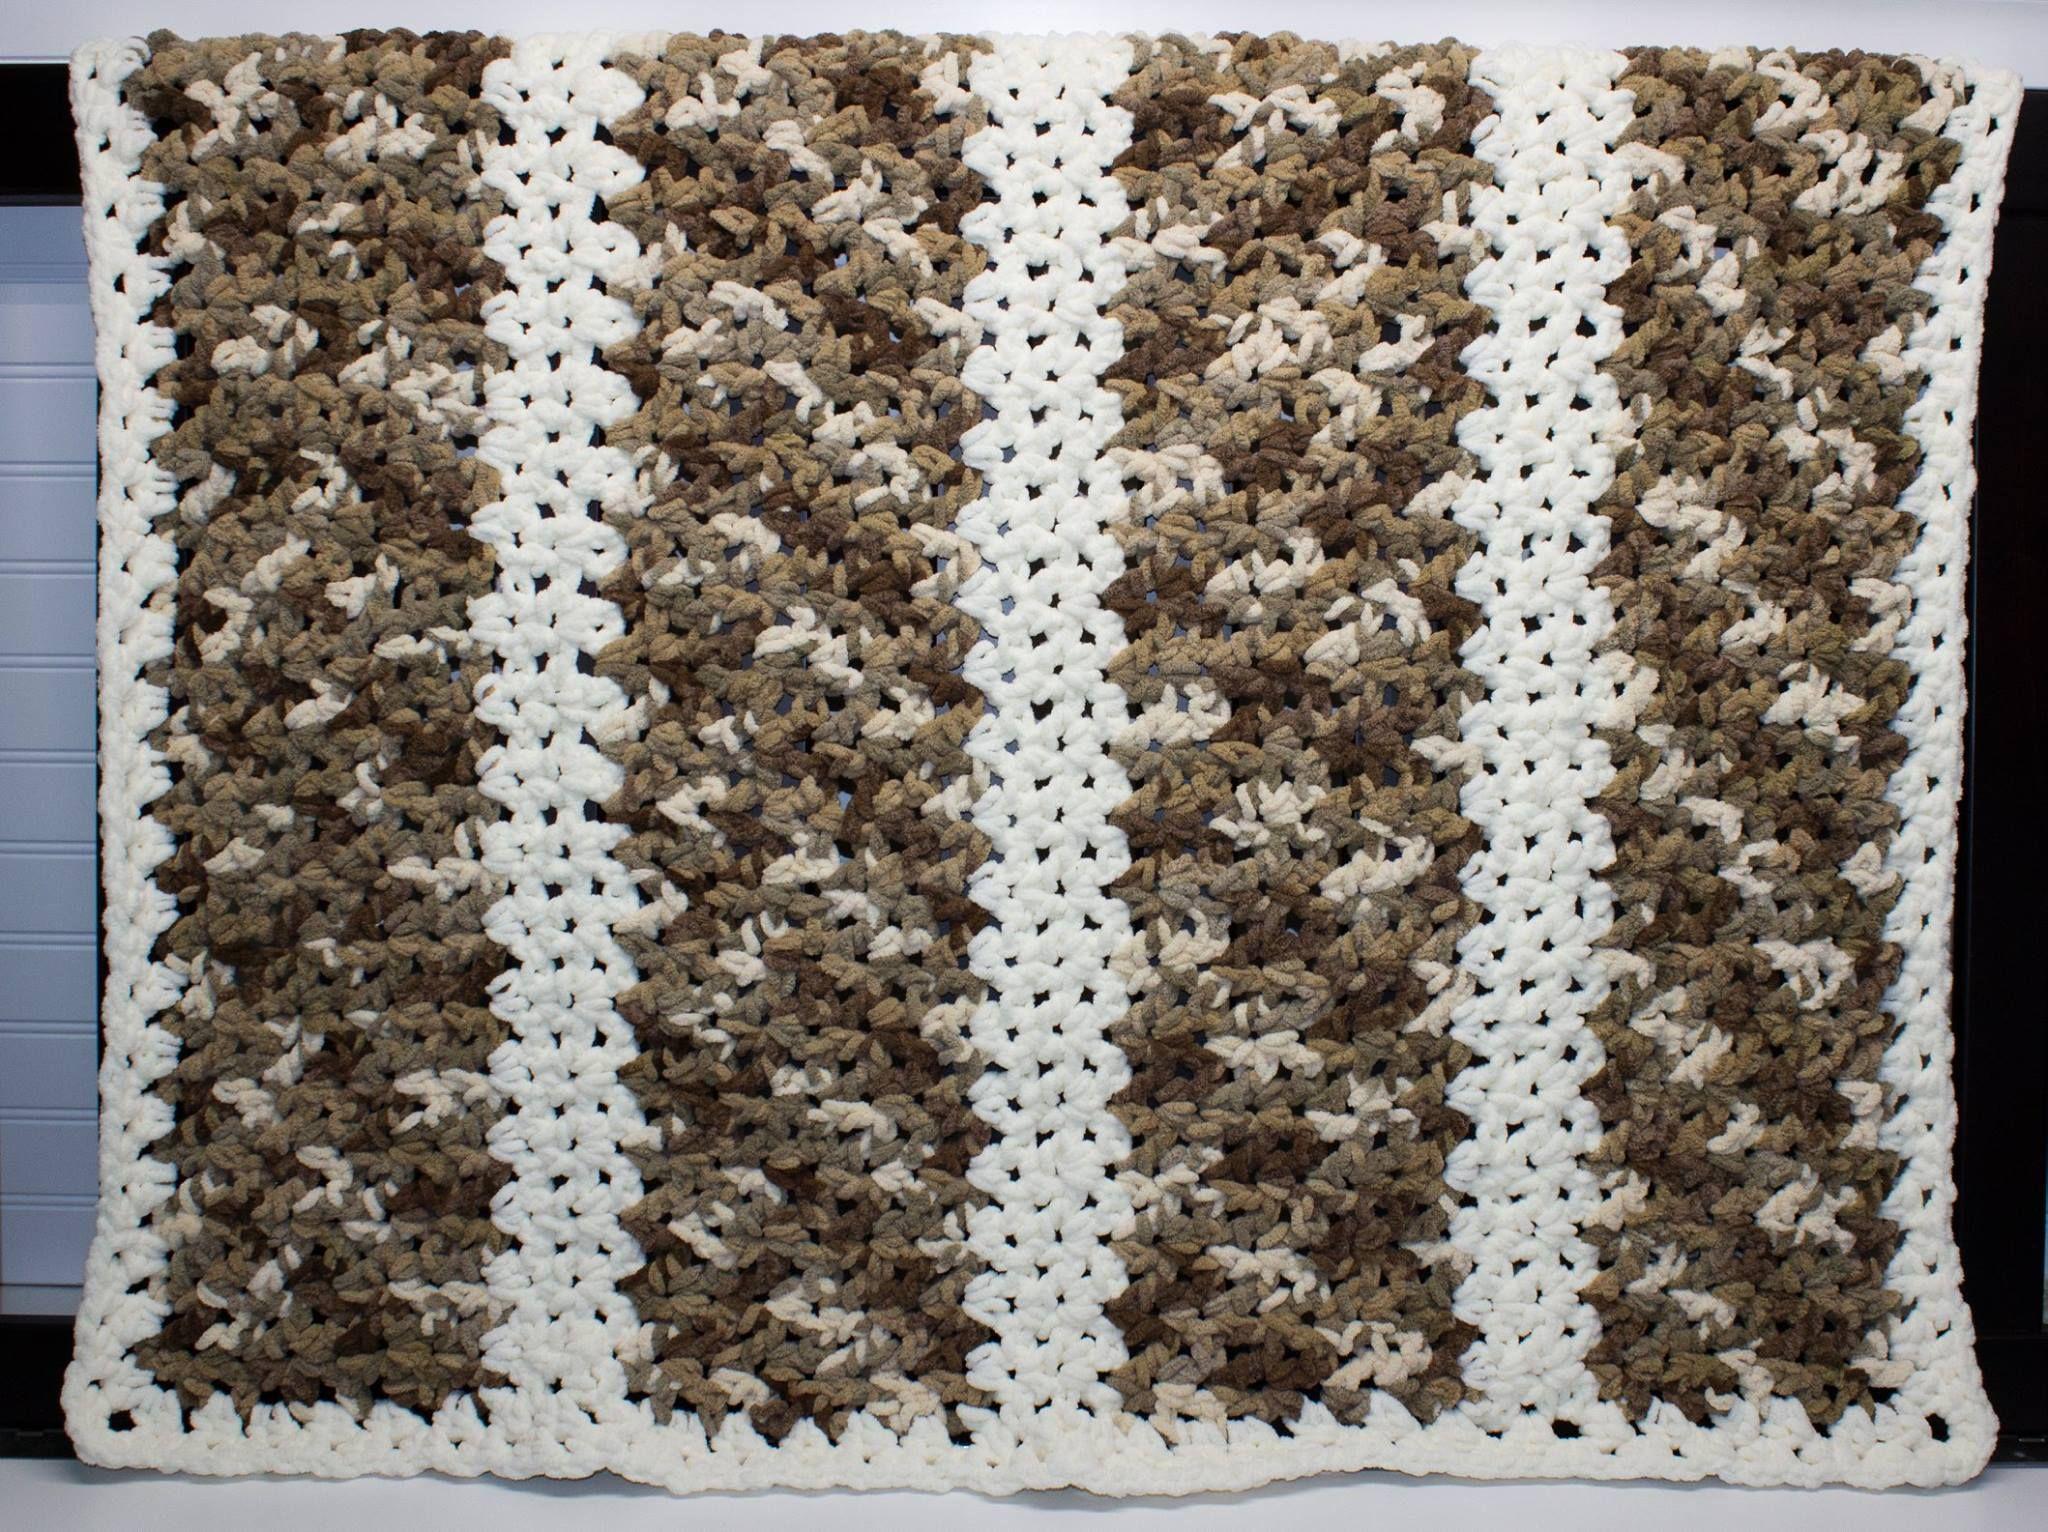 Camo Crocheted Blanket Using Bernat Chunky Blanket Yarn